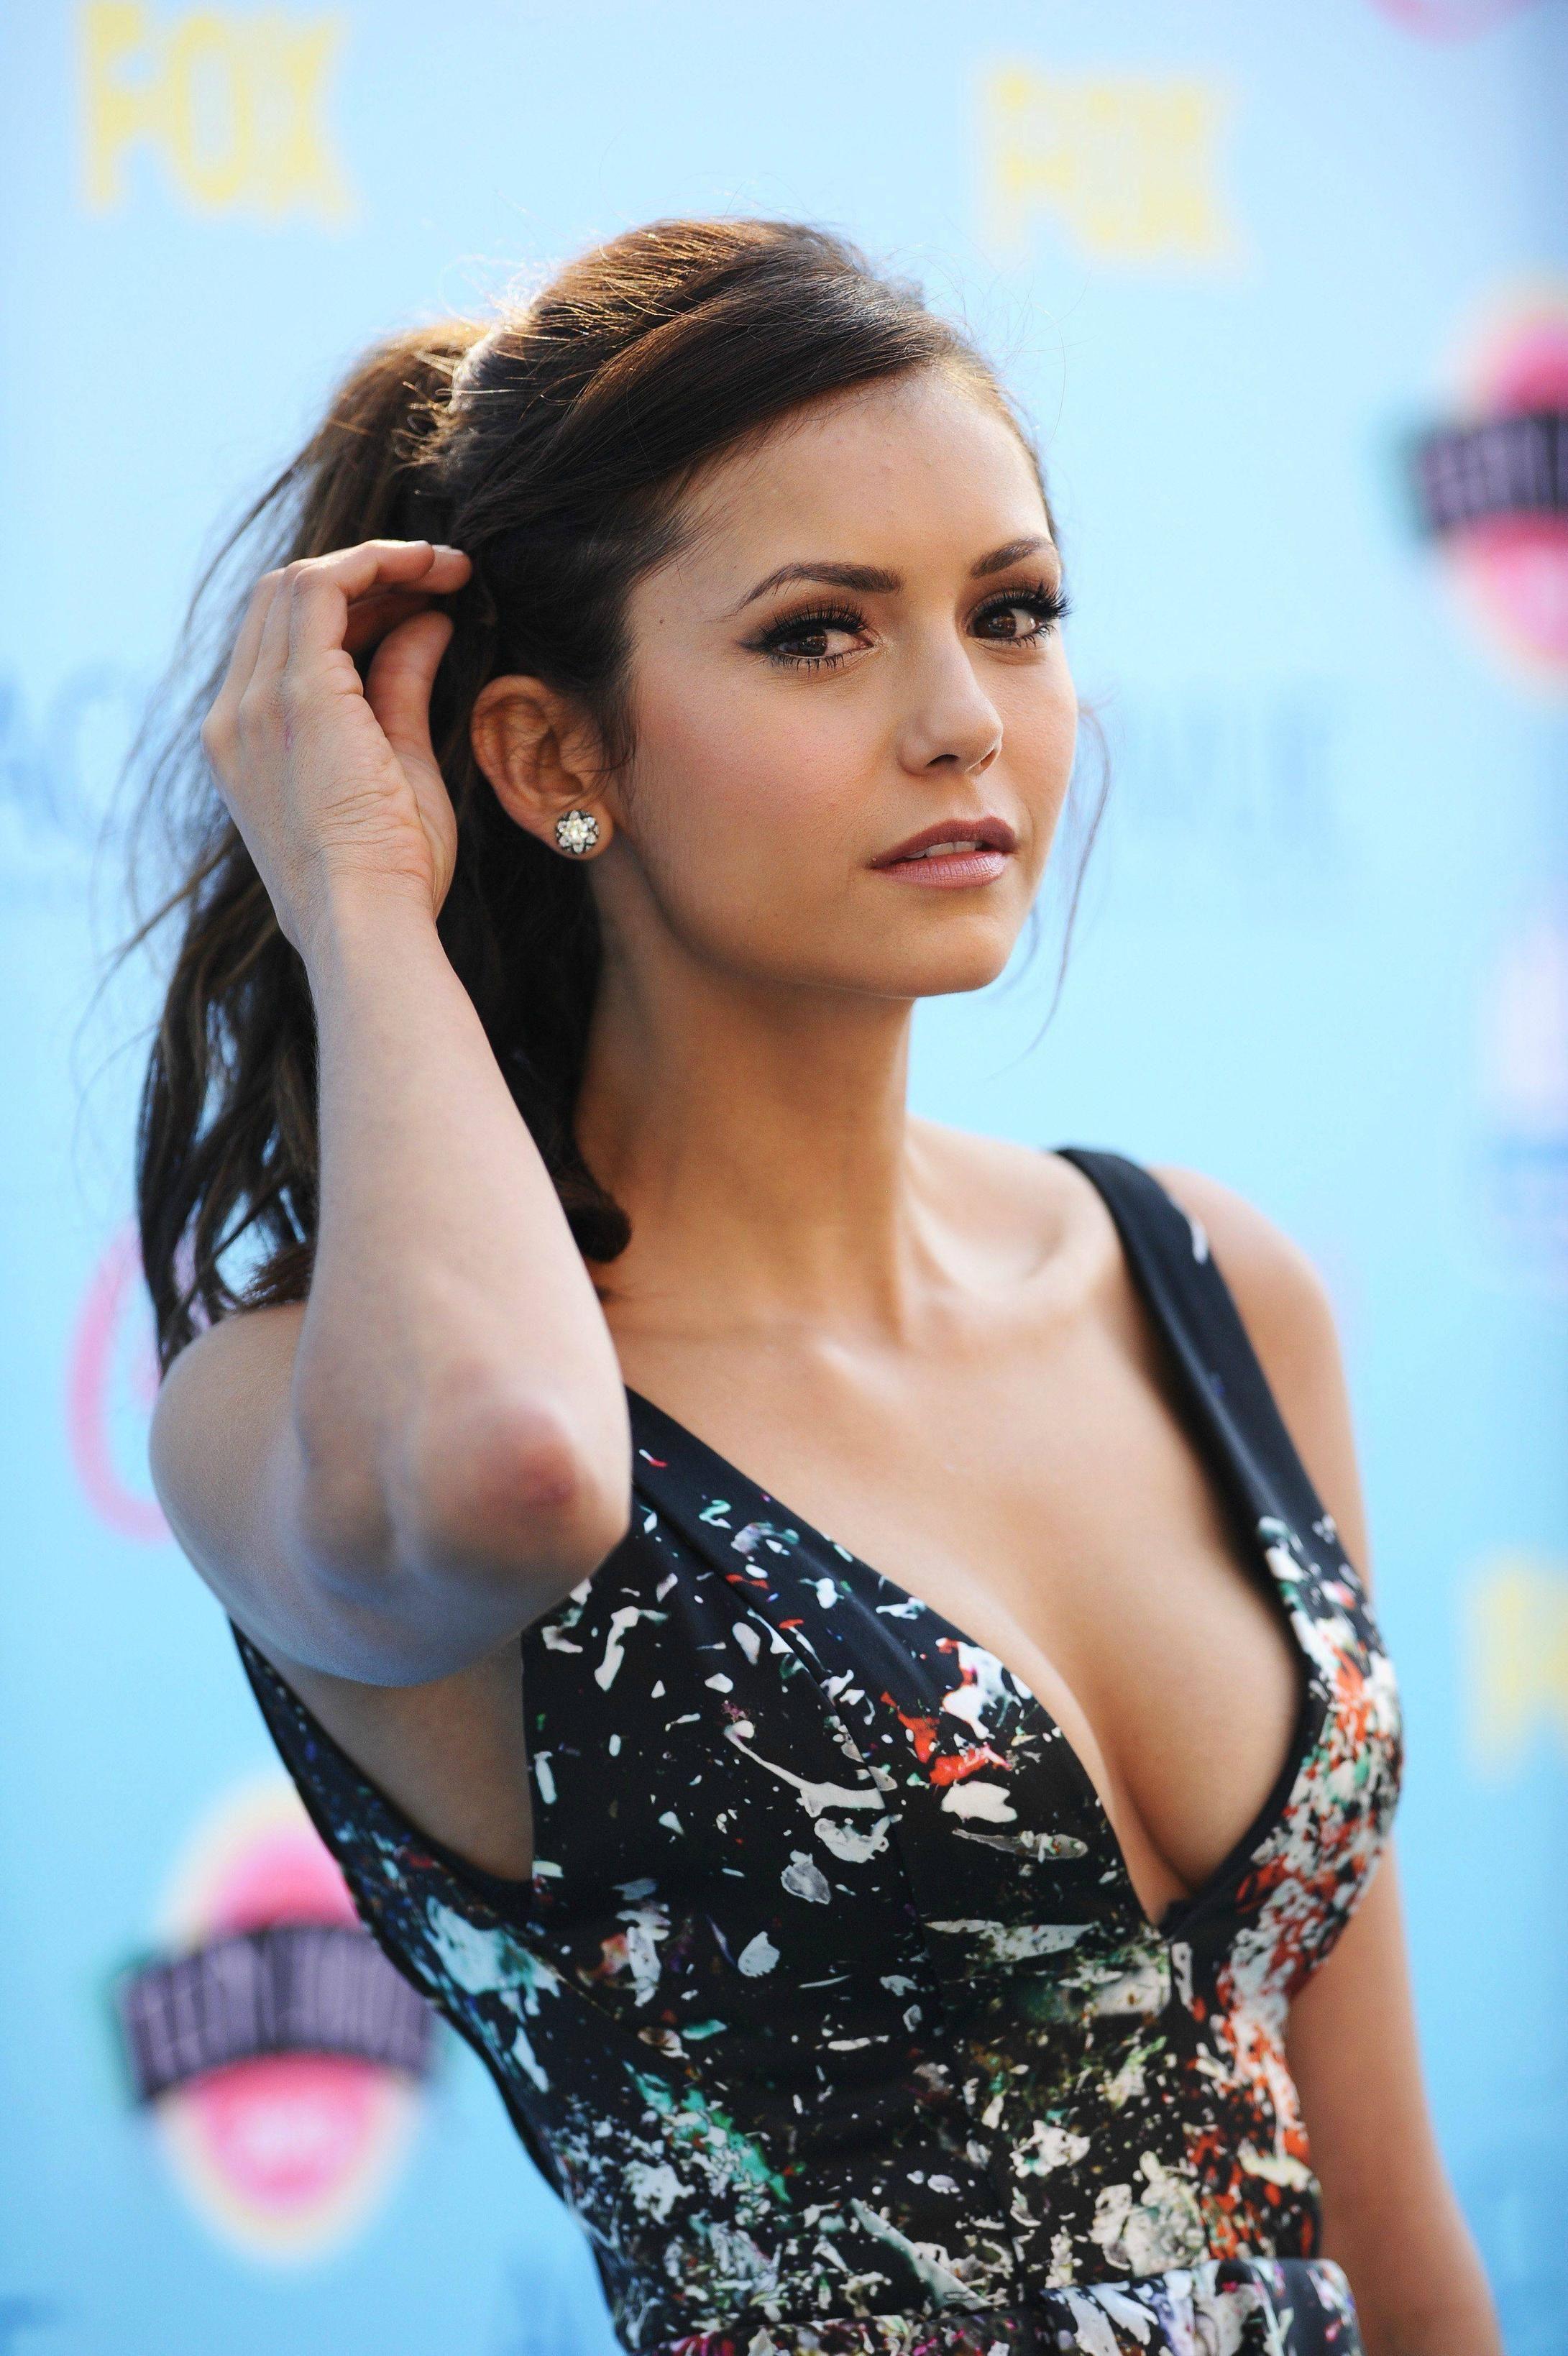 Nina Dobrev Hot Pics photo 26